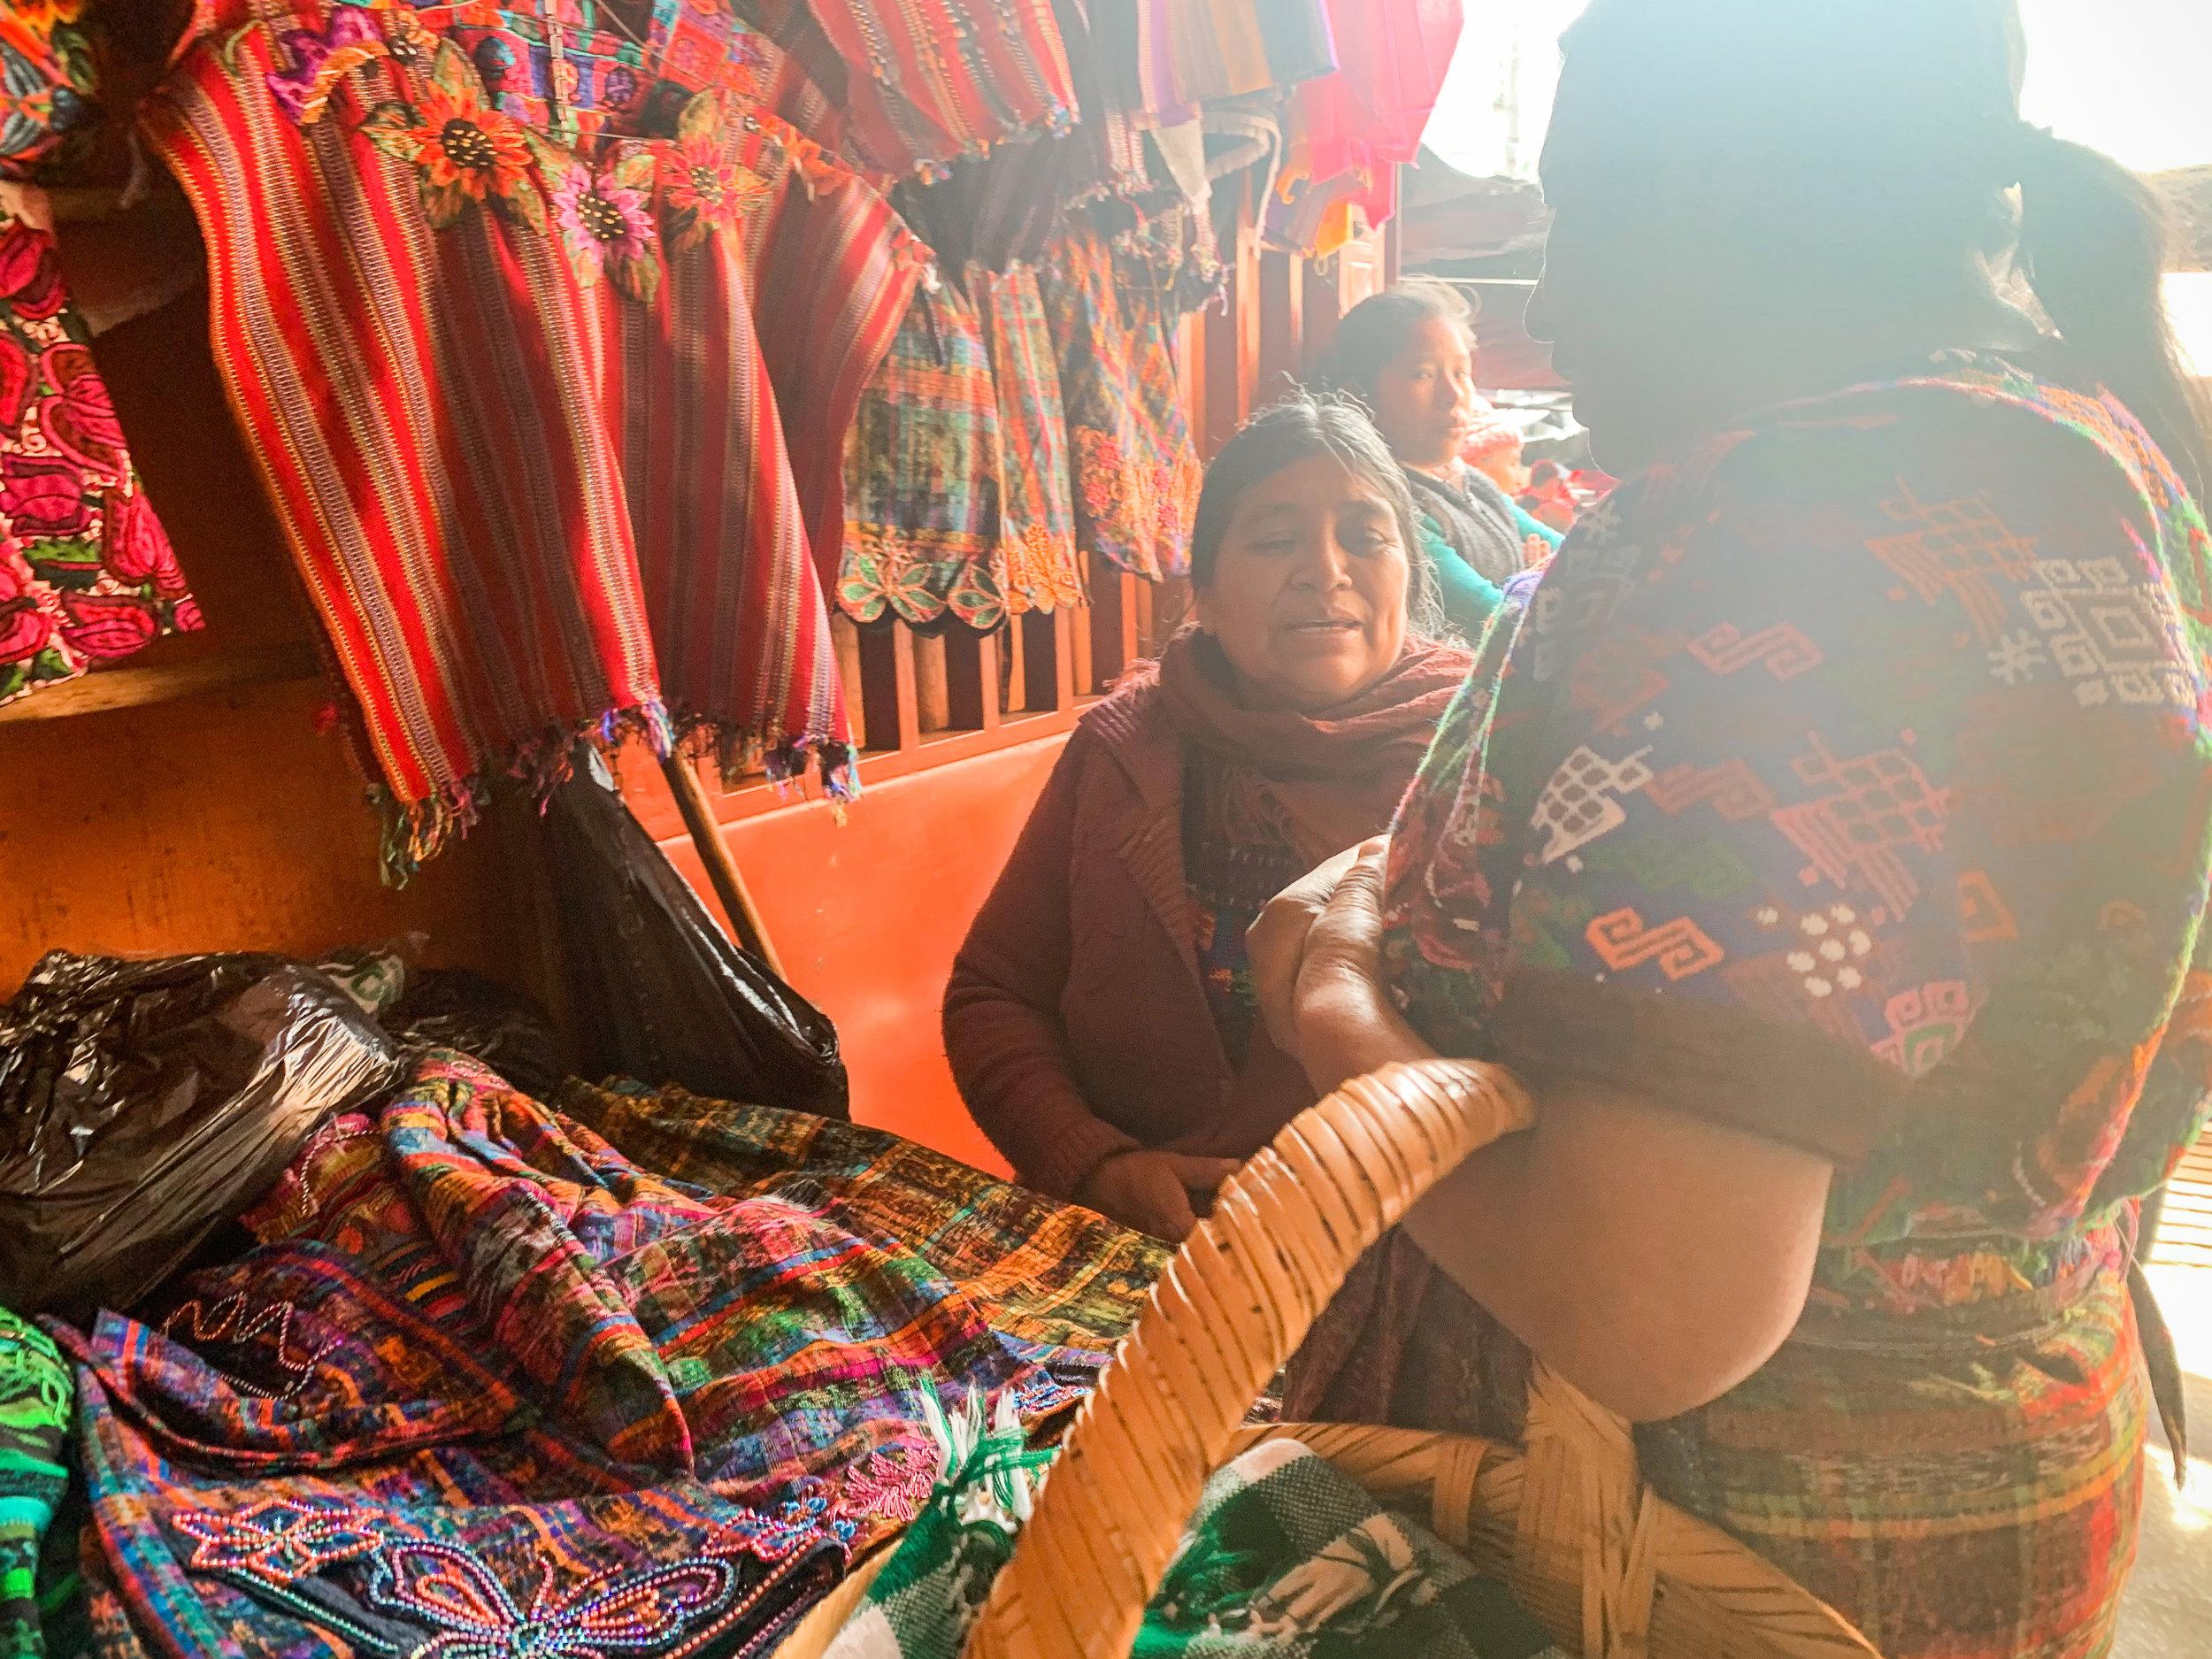 Tecpan Guatemala market day mercado Misty Prochaska iPhone XS-8.jpg